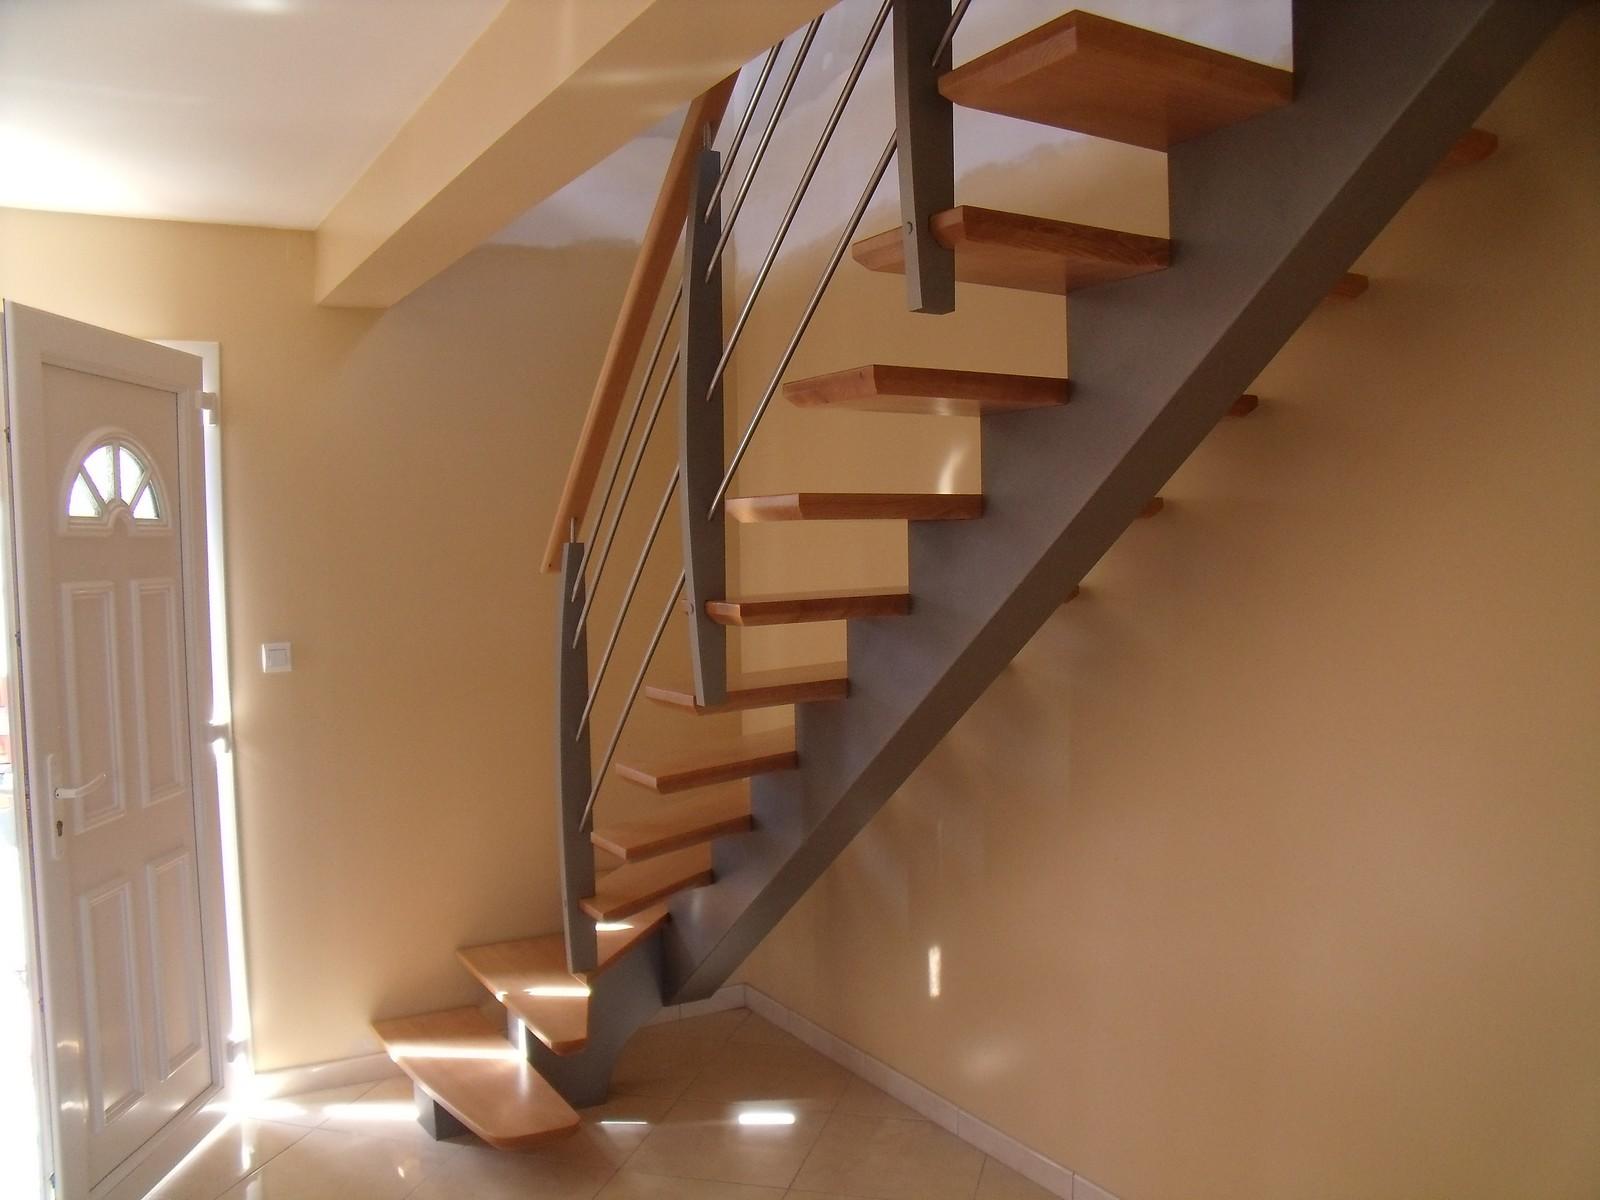 1 4 tournant atelier glotin pontchateau. Black Bedroom Furniture Sets. Home Design Ideas